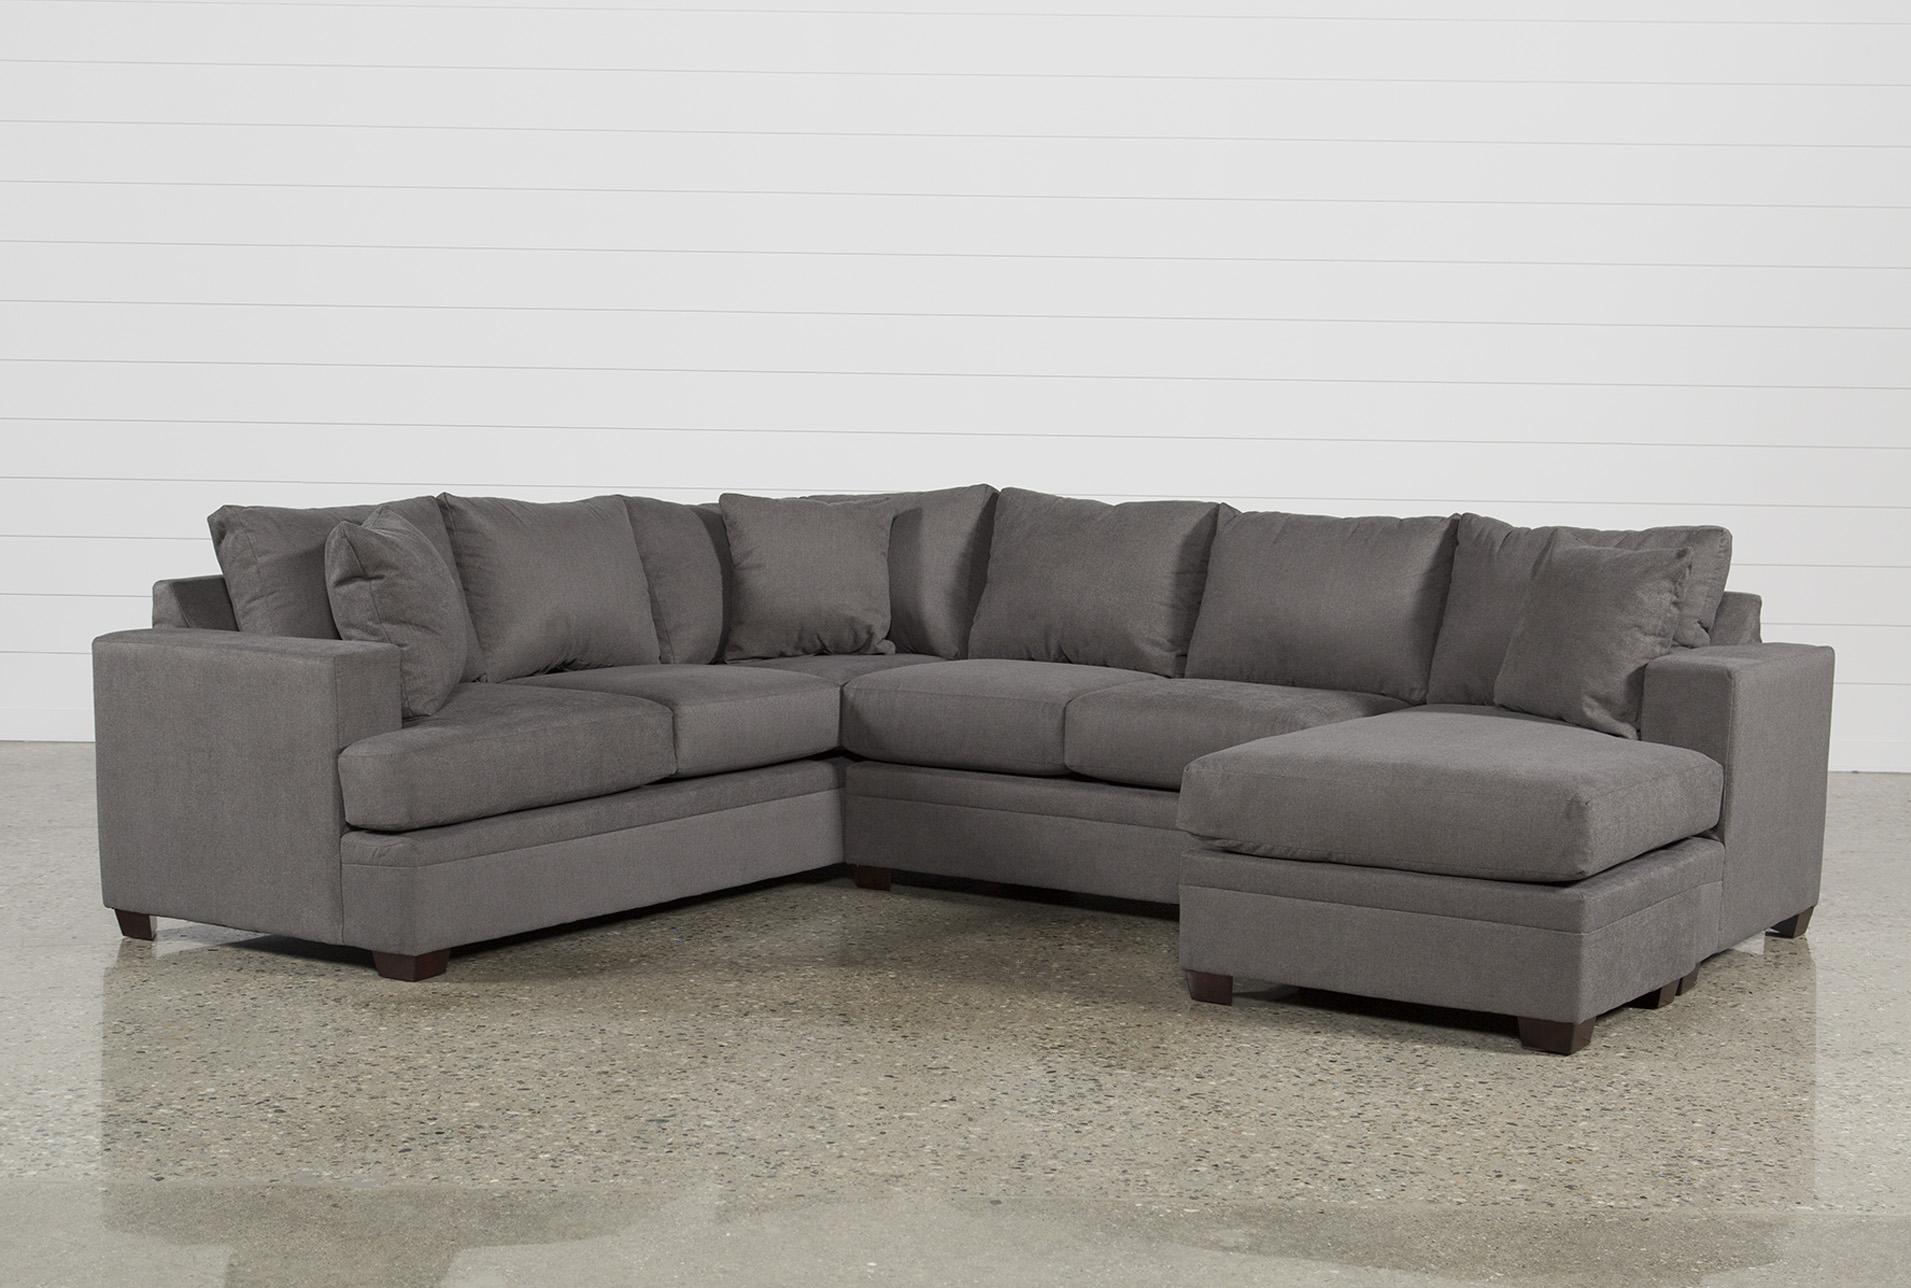 sectional sofa black friday deals